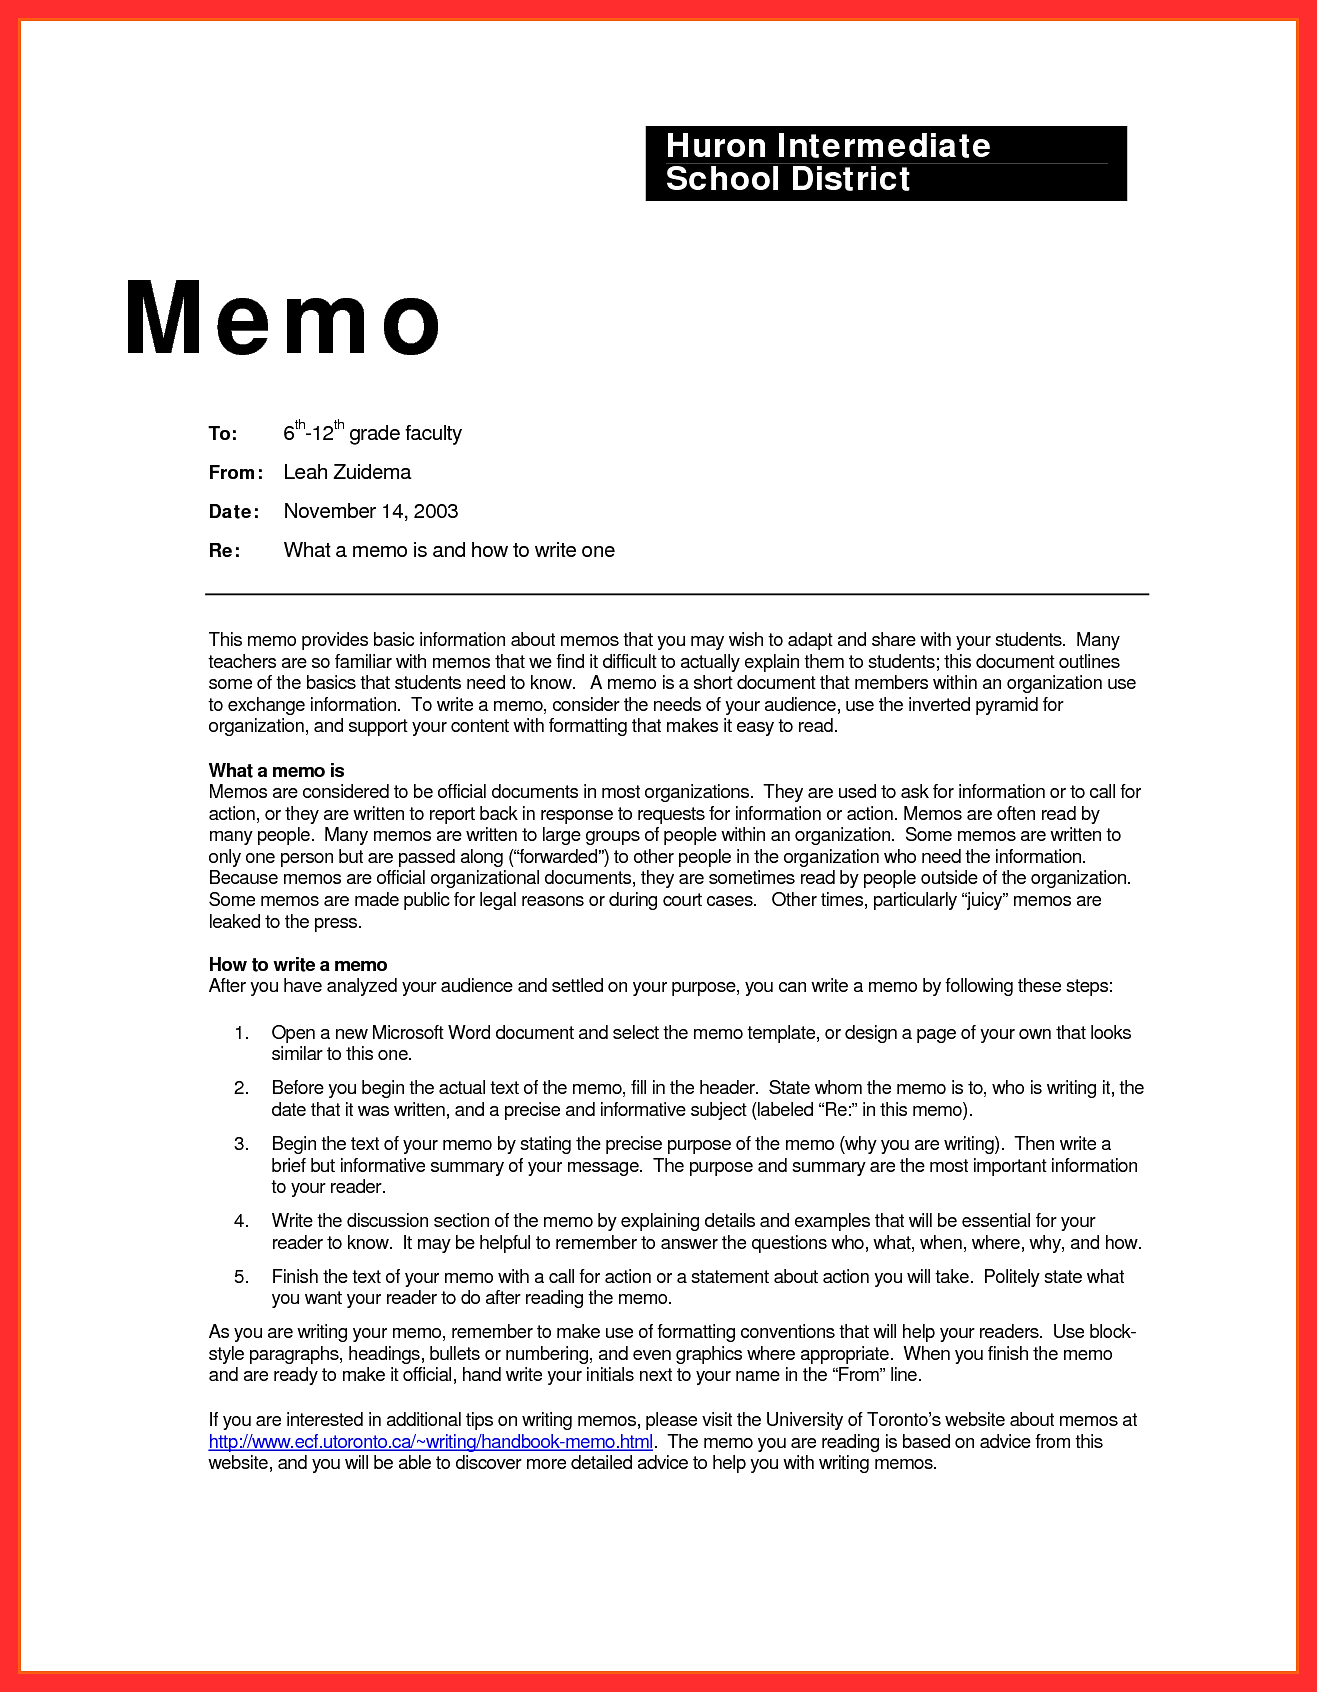 huron intermediate schol district memo writing examples